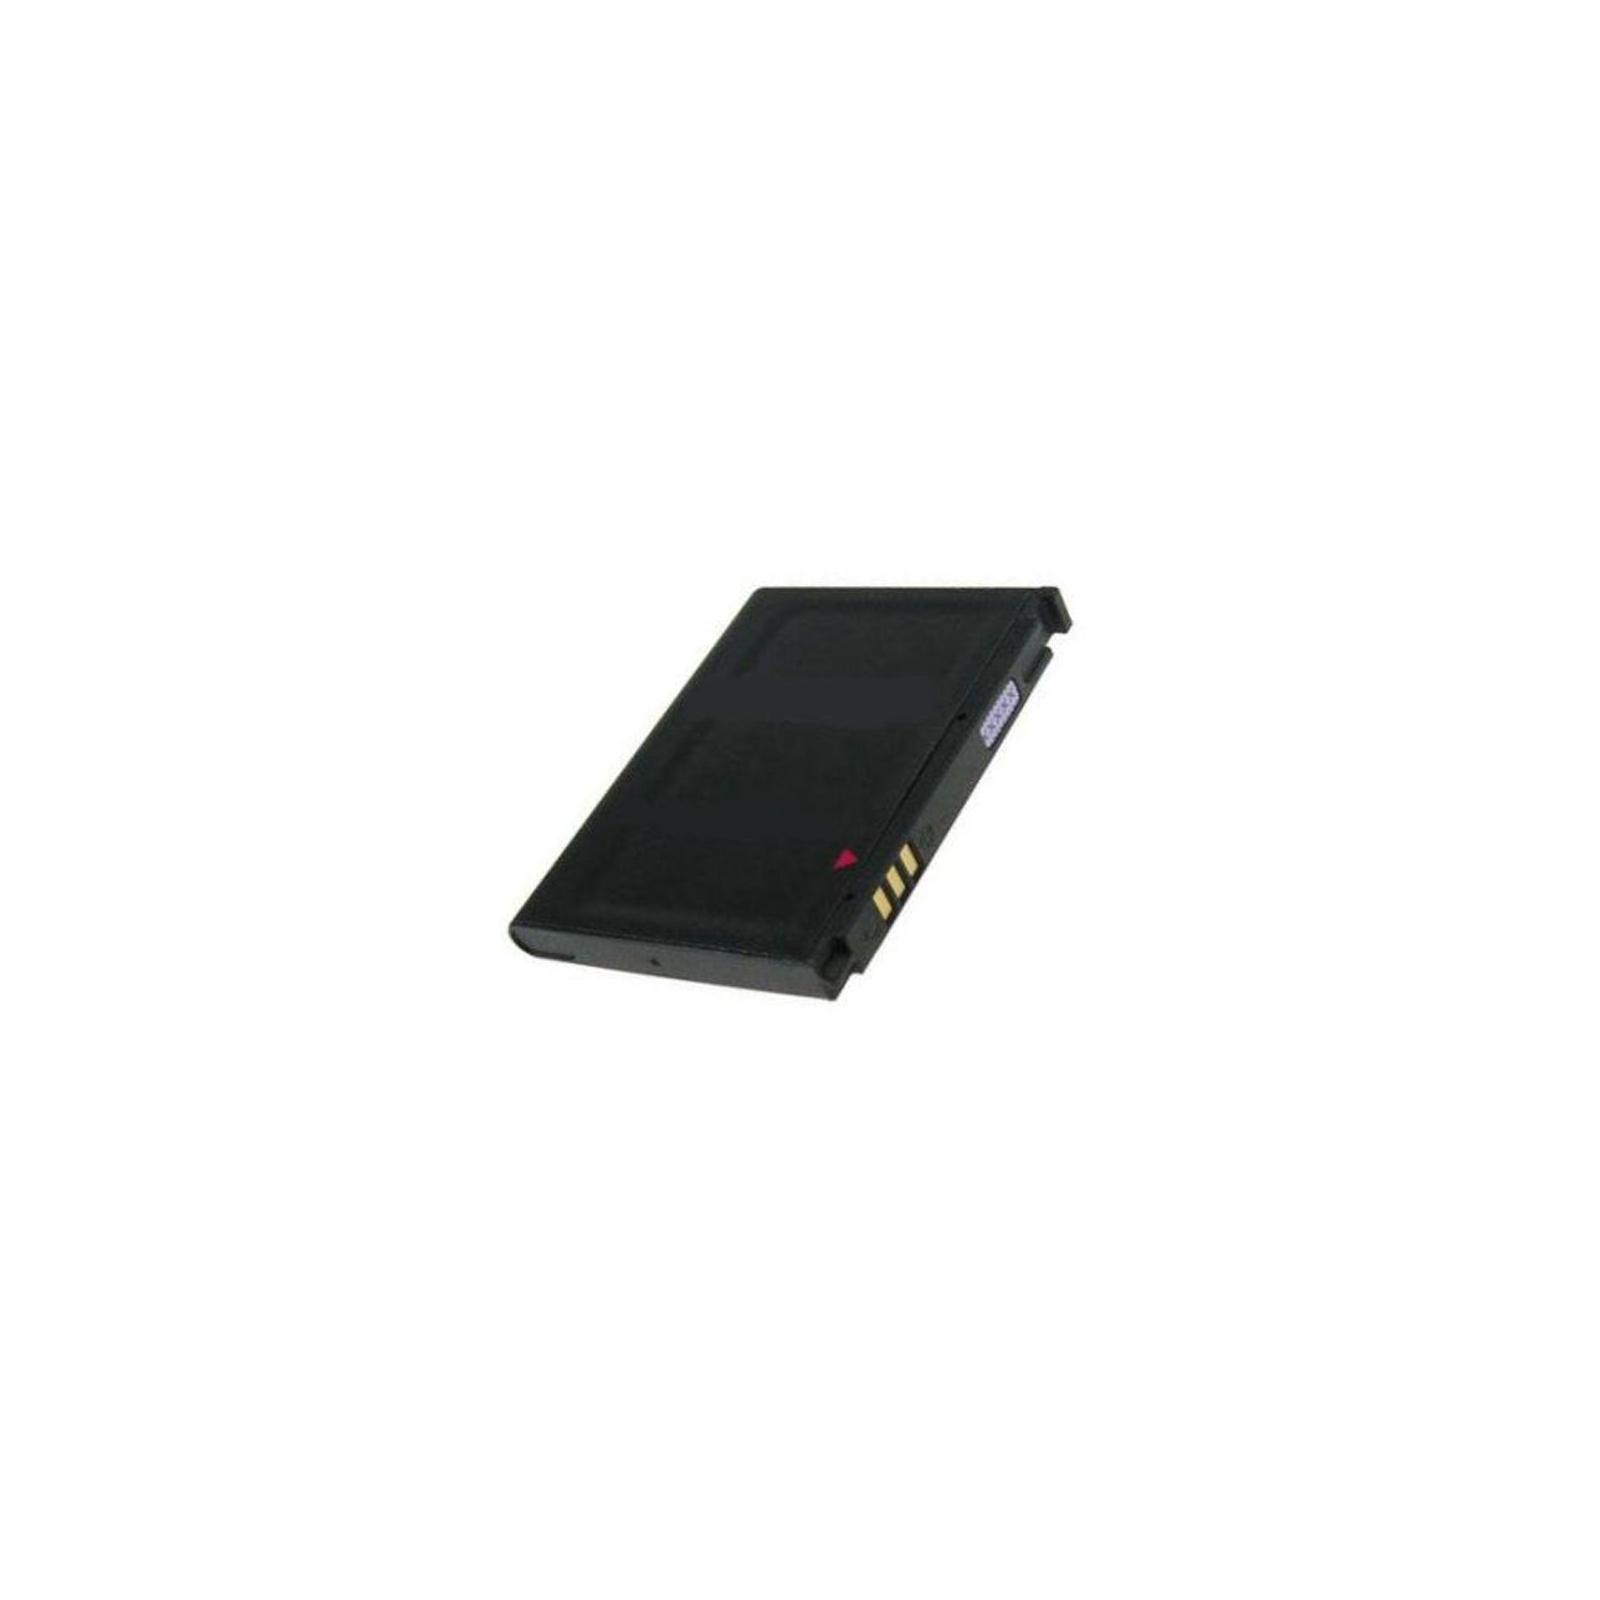 Аккумуляторная батарея PowerPlant Samsung F708, F498, M8800, T929, M8800C |AB563840CE| (DV00DV6103)